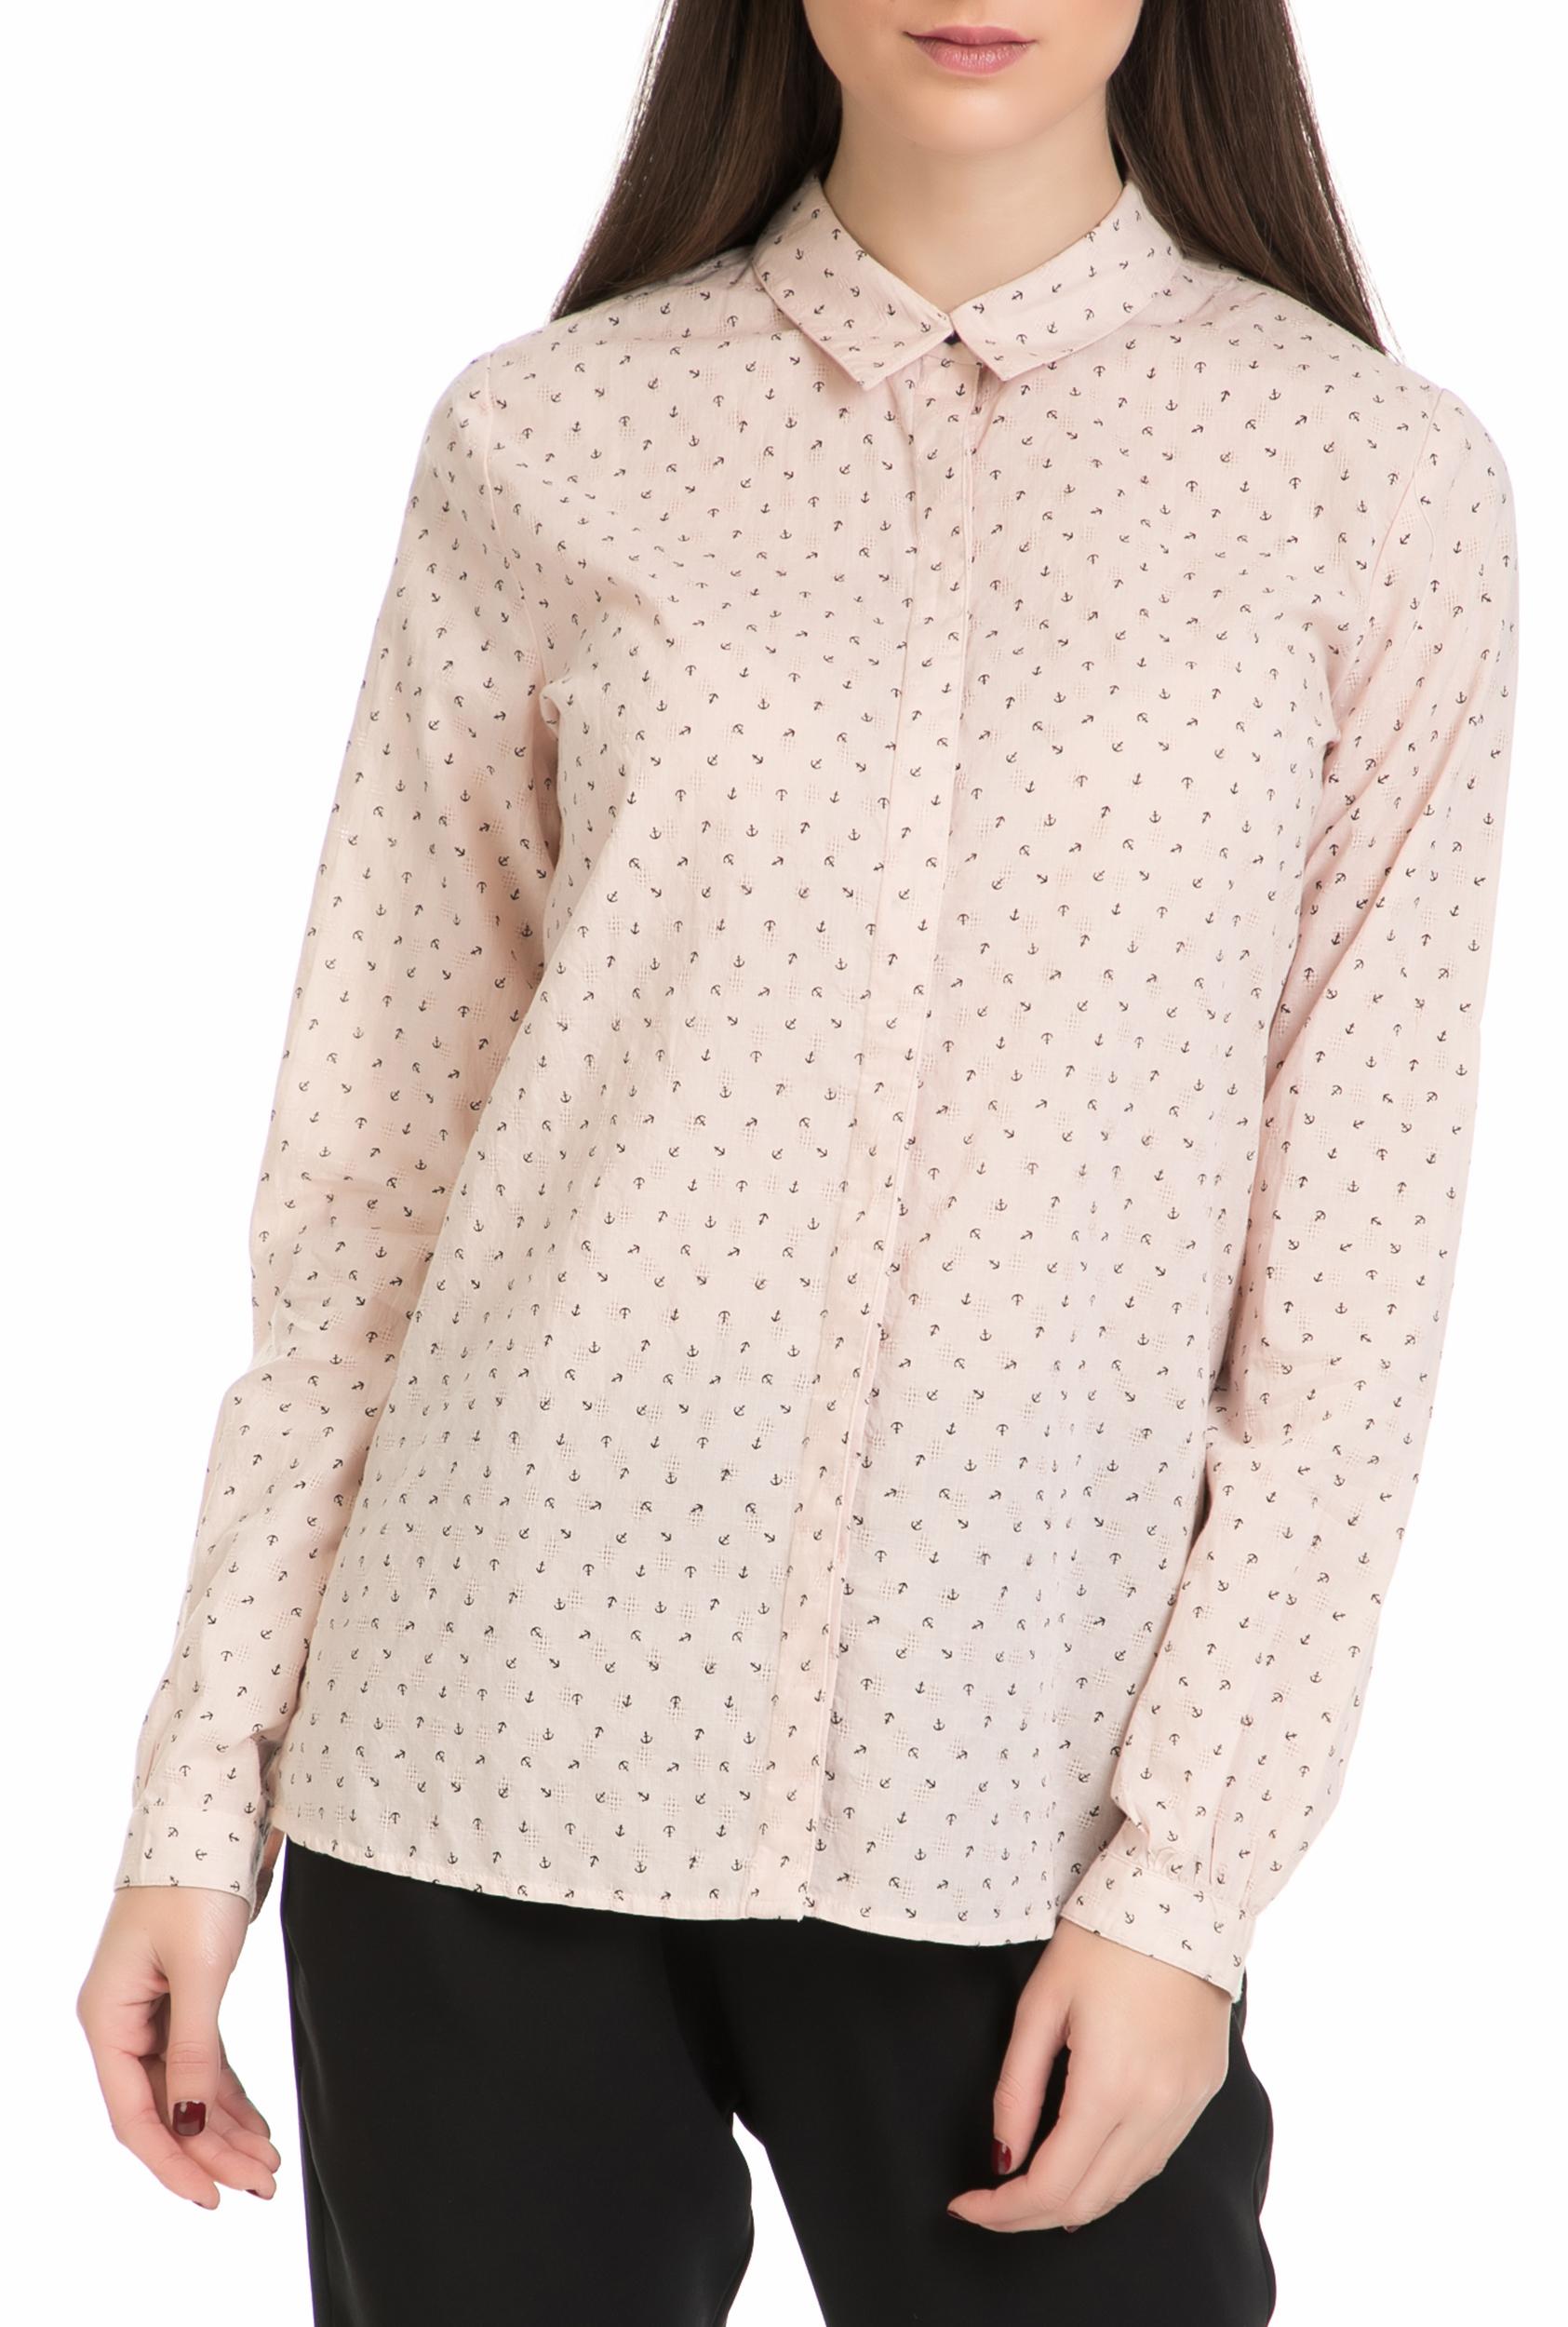 SCOTCH & SODA - Γυναικείο πουκάμισο MAISON SCOTCH ροζ γυναικεία ρούχα πουκάμισα μακρυμάνικα